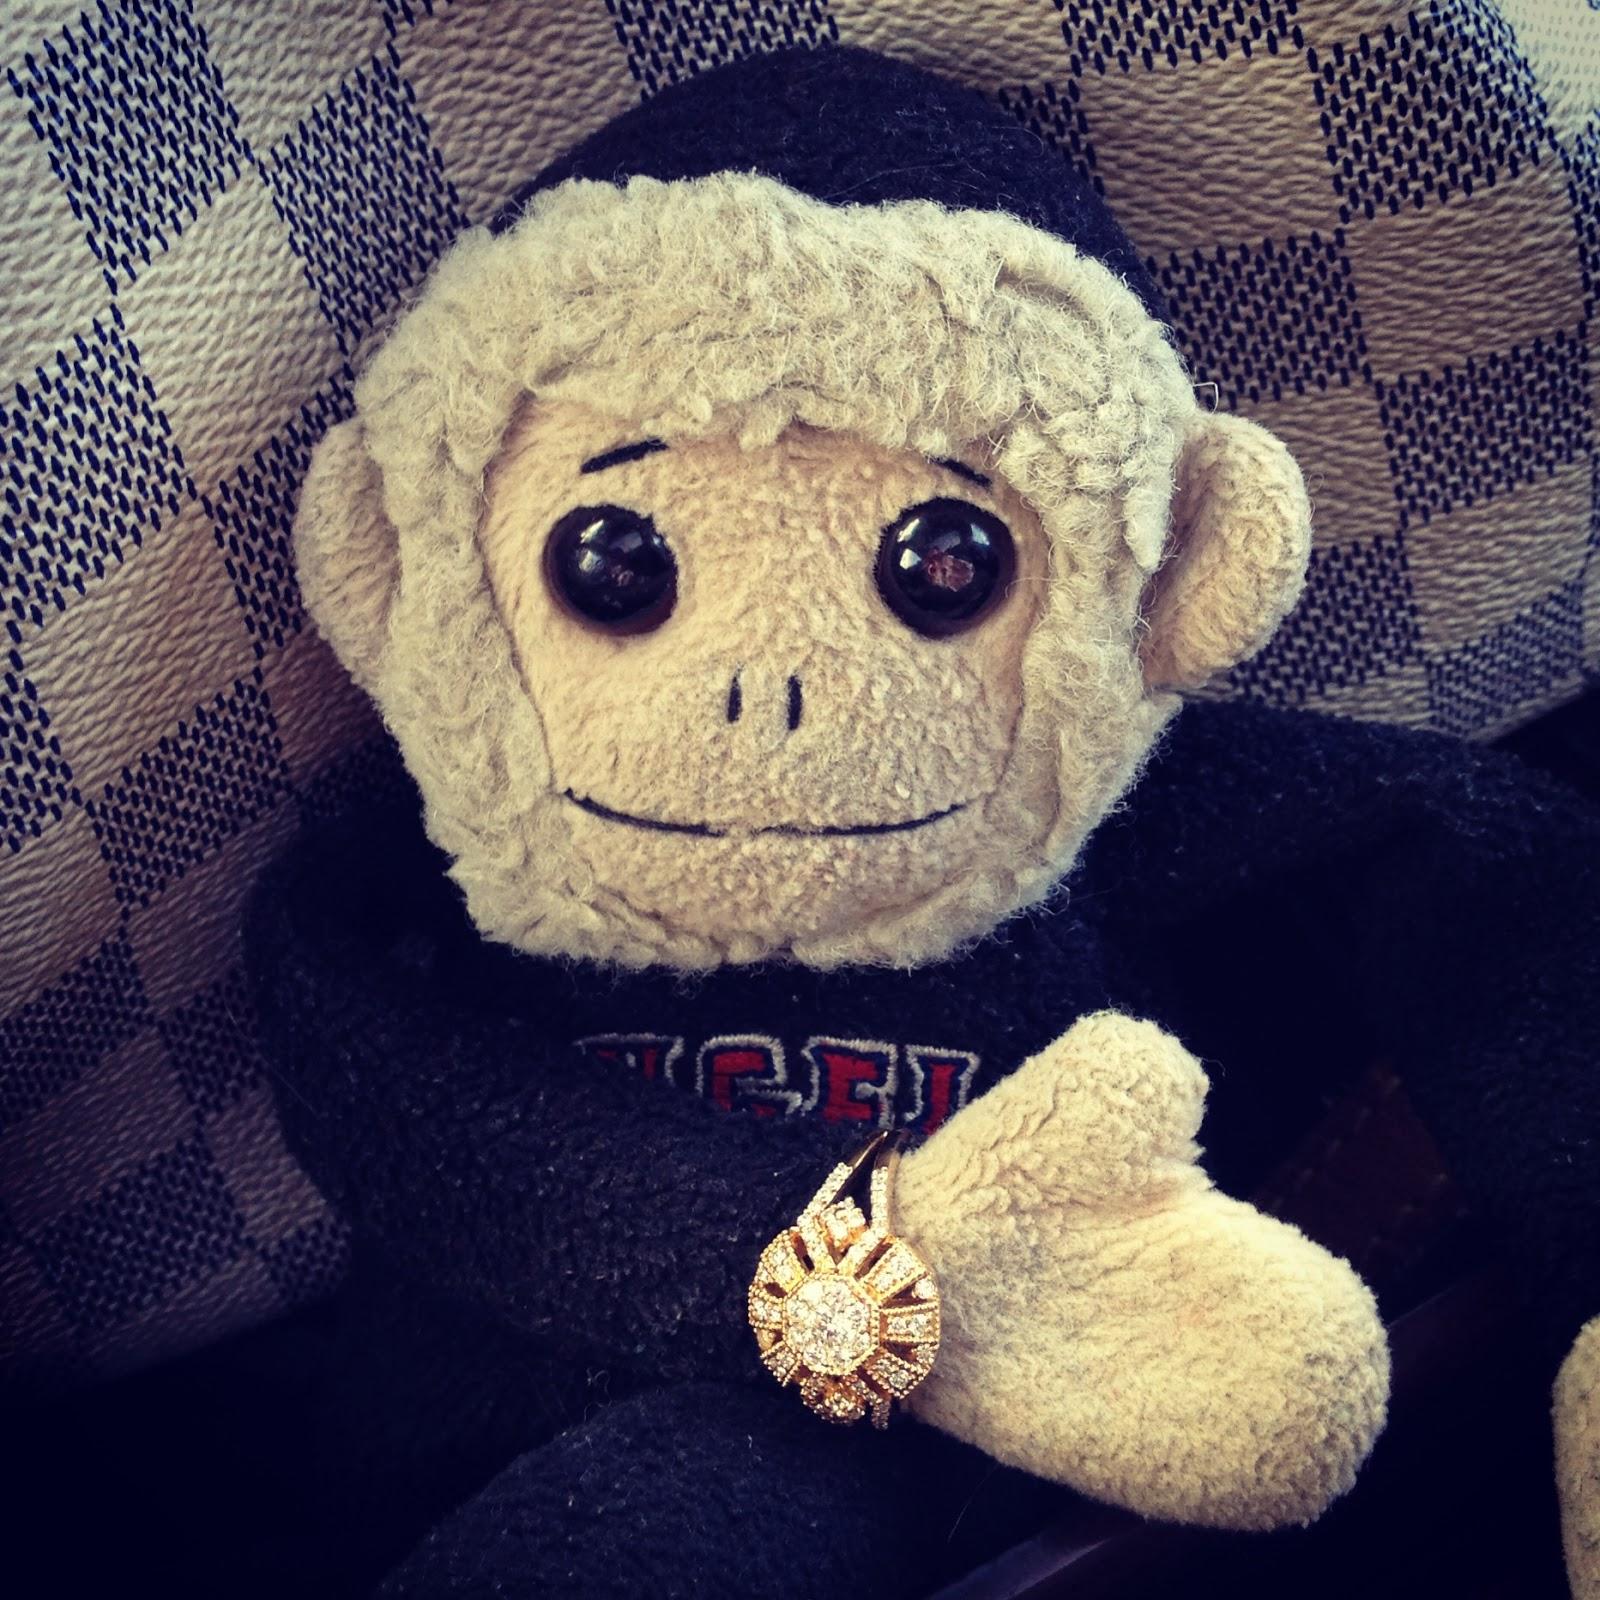 tuna the monkey, tuna, beanie baby, monkey, ty, angels, rally monkey, ring bearer, gold, diamonds, costco jewelry, ring, wedding ring, engagement ring,  date, lunch date